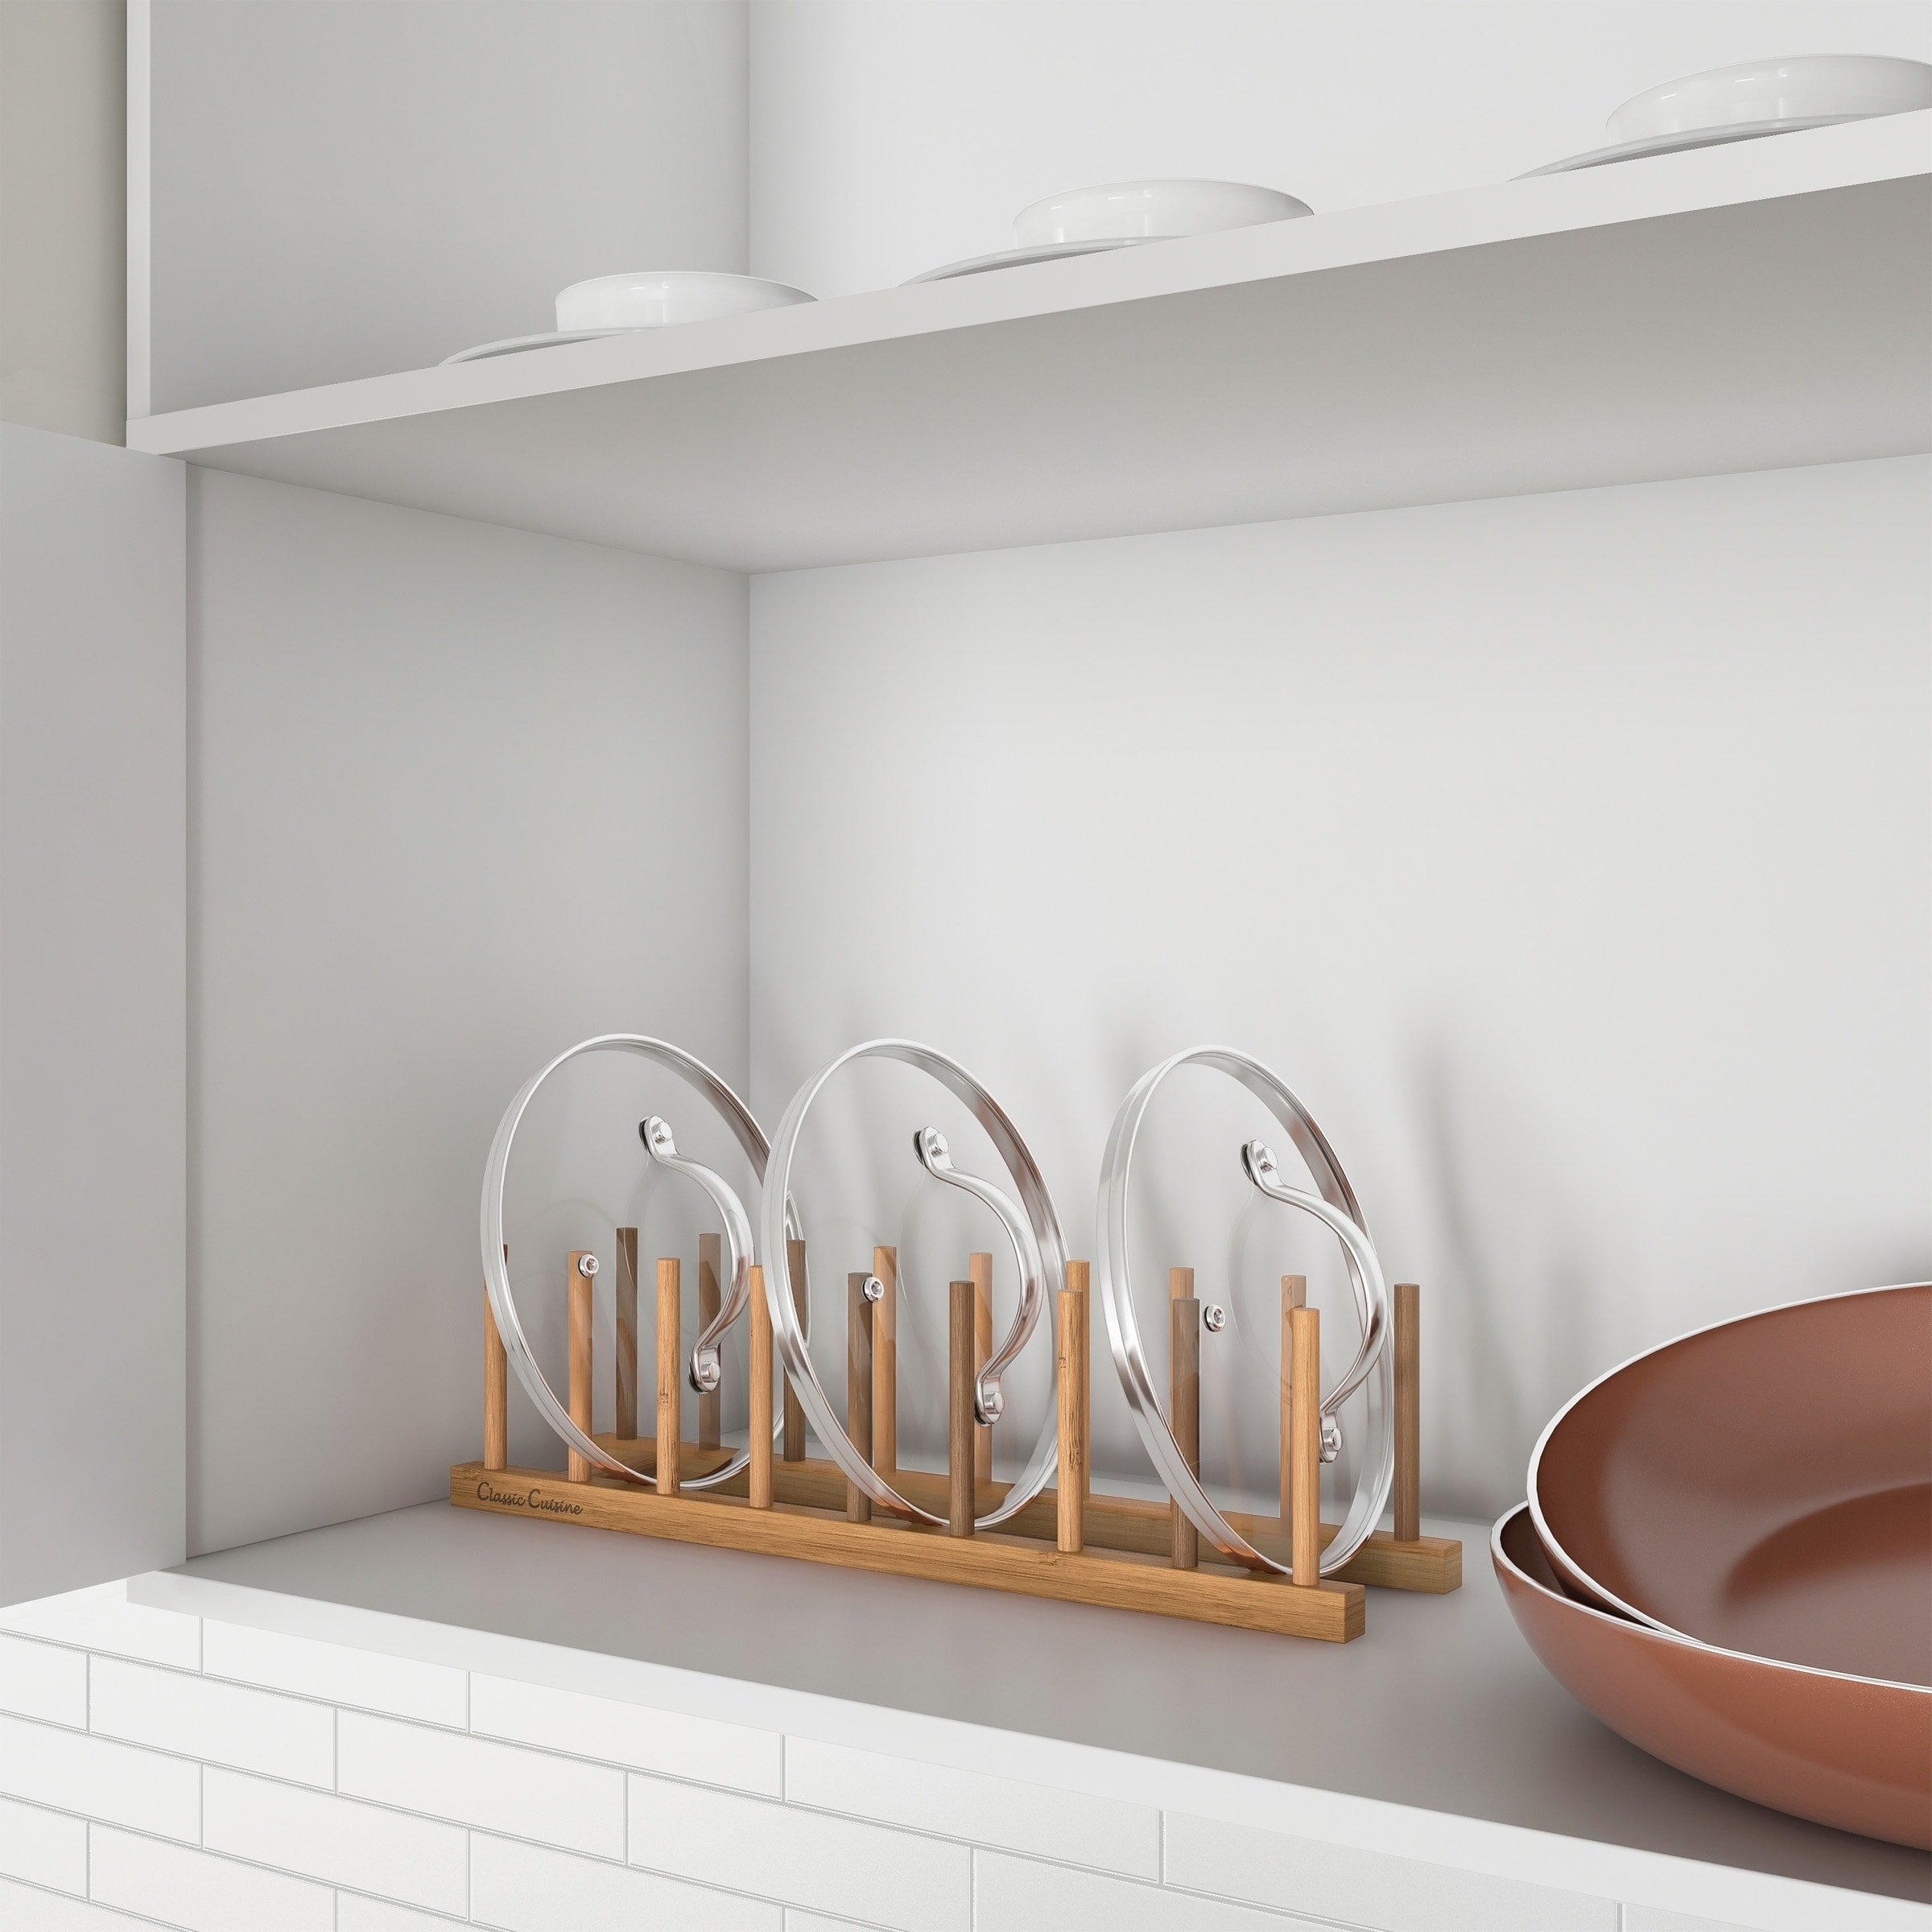 Shop Bamboo Plate Holder – Wood Vertical Dish Organizer Peg Board